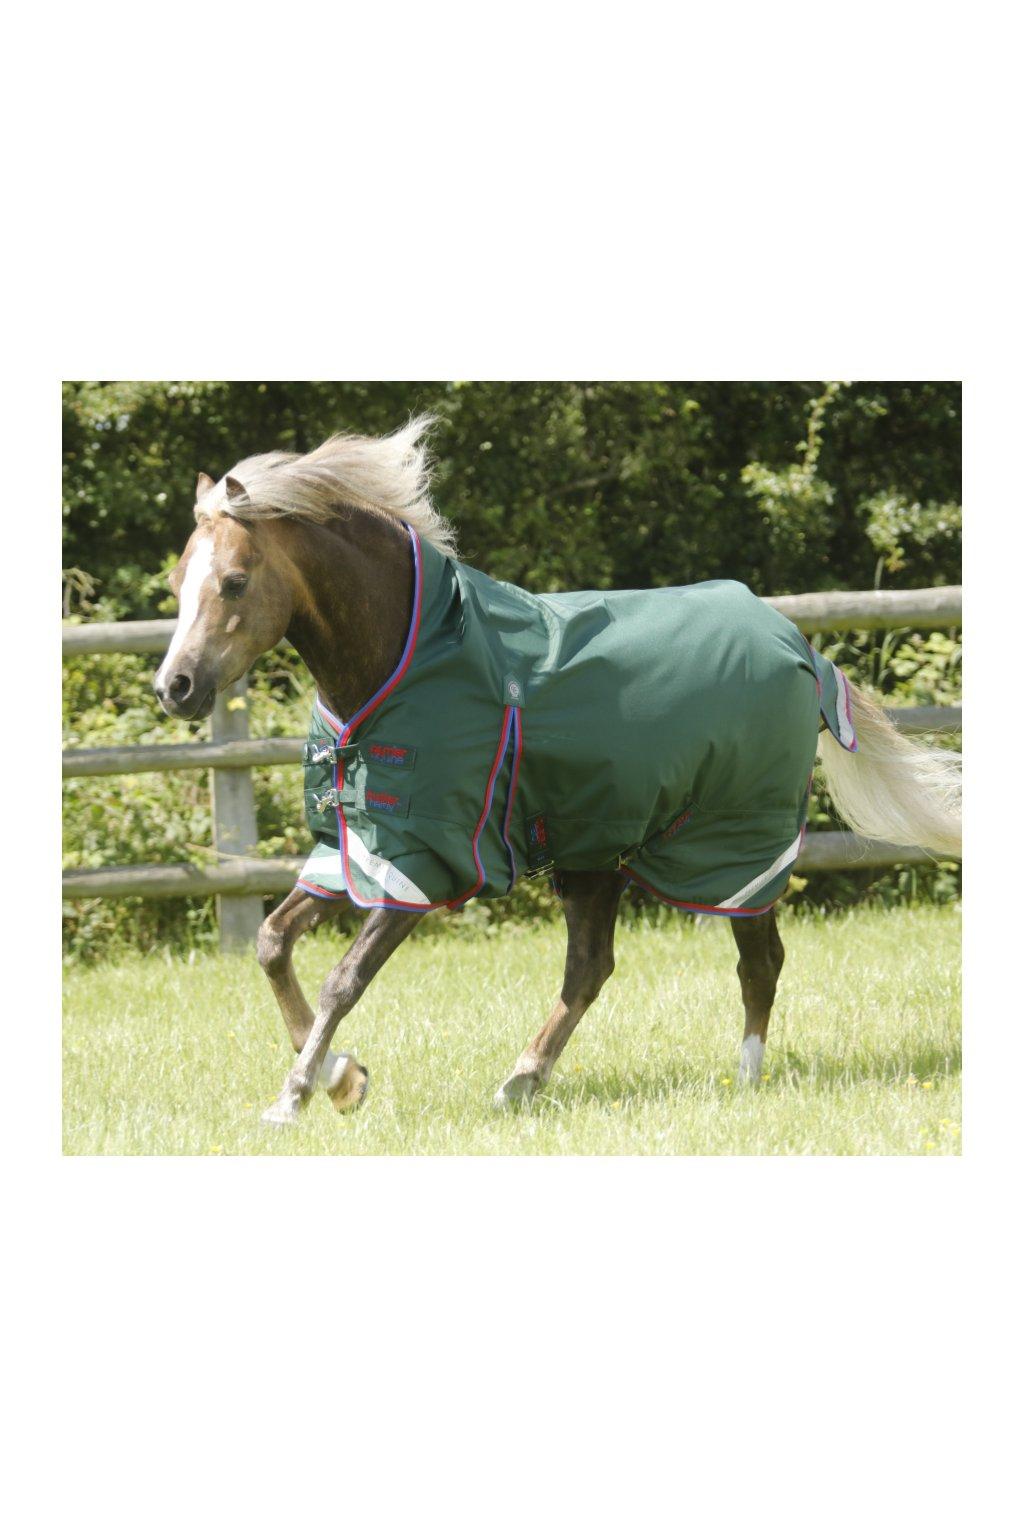 Pony Buster Hardy 0g Green Main Running Image 900x775x900